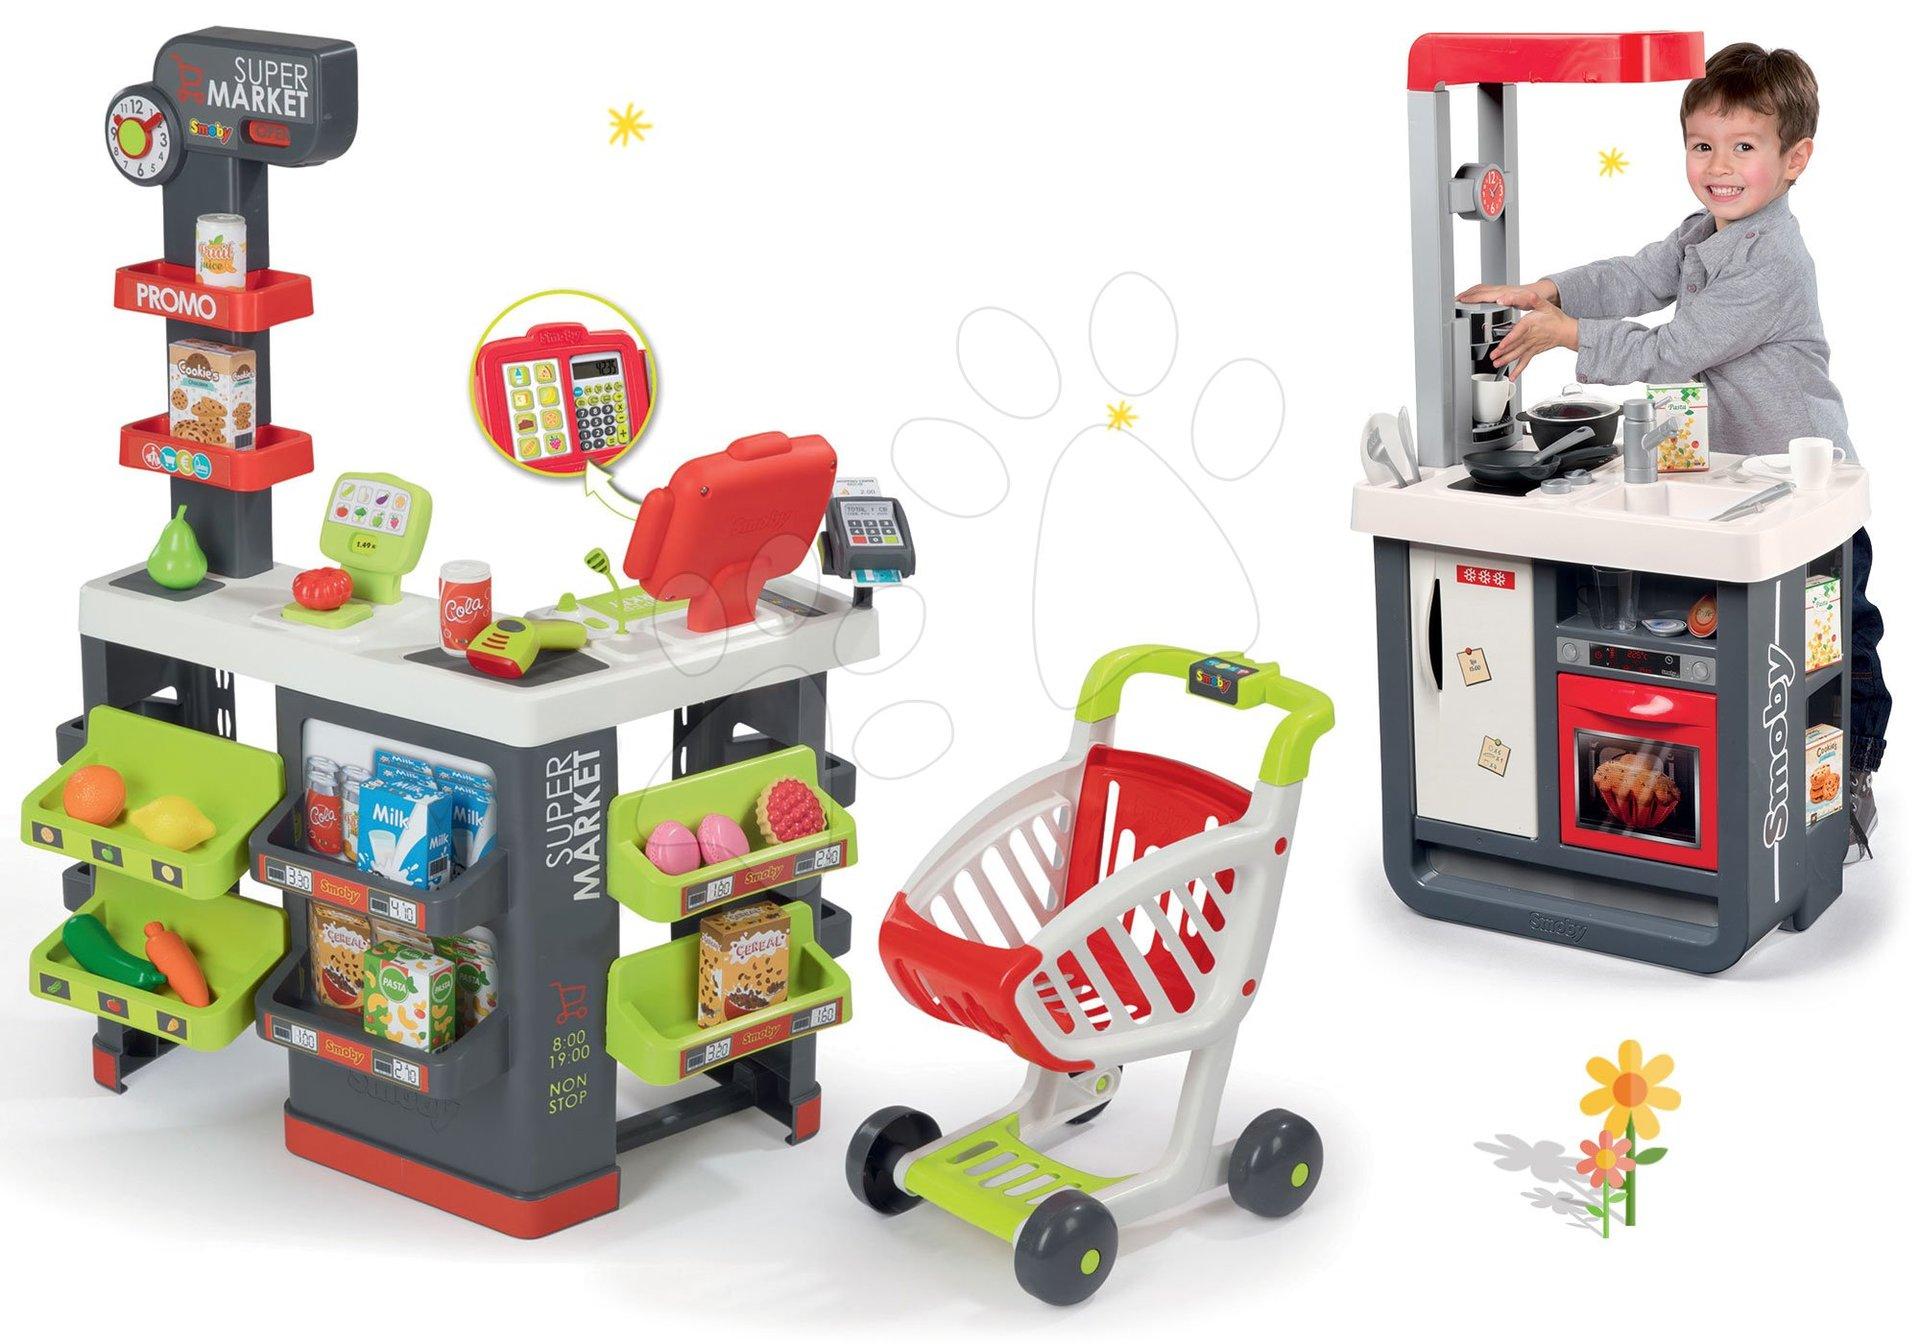 Smoby set obchod s vozíkem Supermarket a kuchyňka Gourmande s chladničkou a kávovarom 350213-2